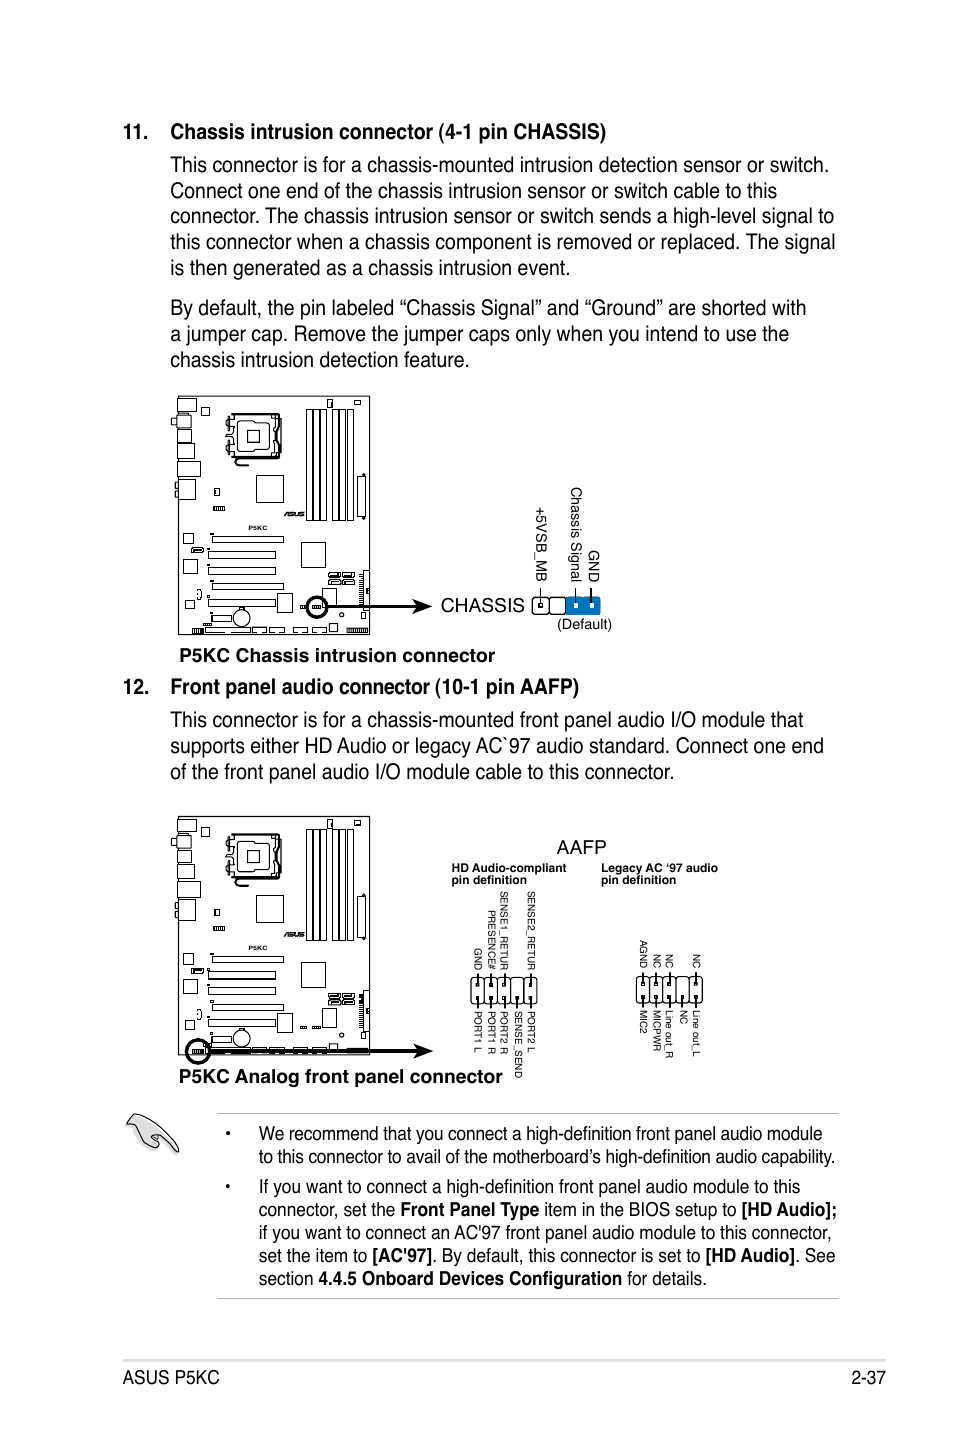 Realtek Alc 883 Chipset Drivers For Mac